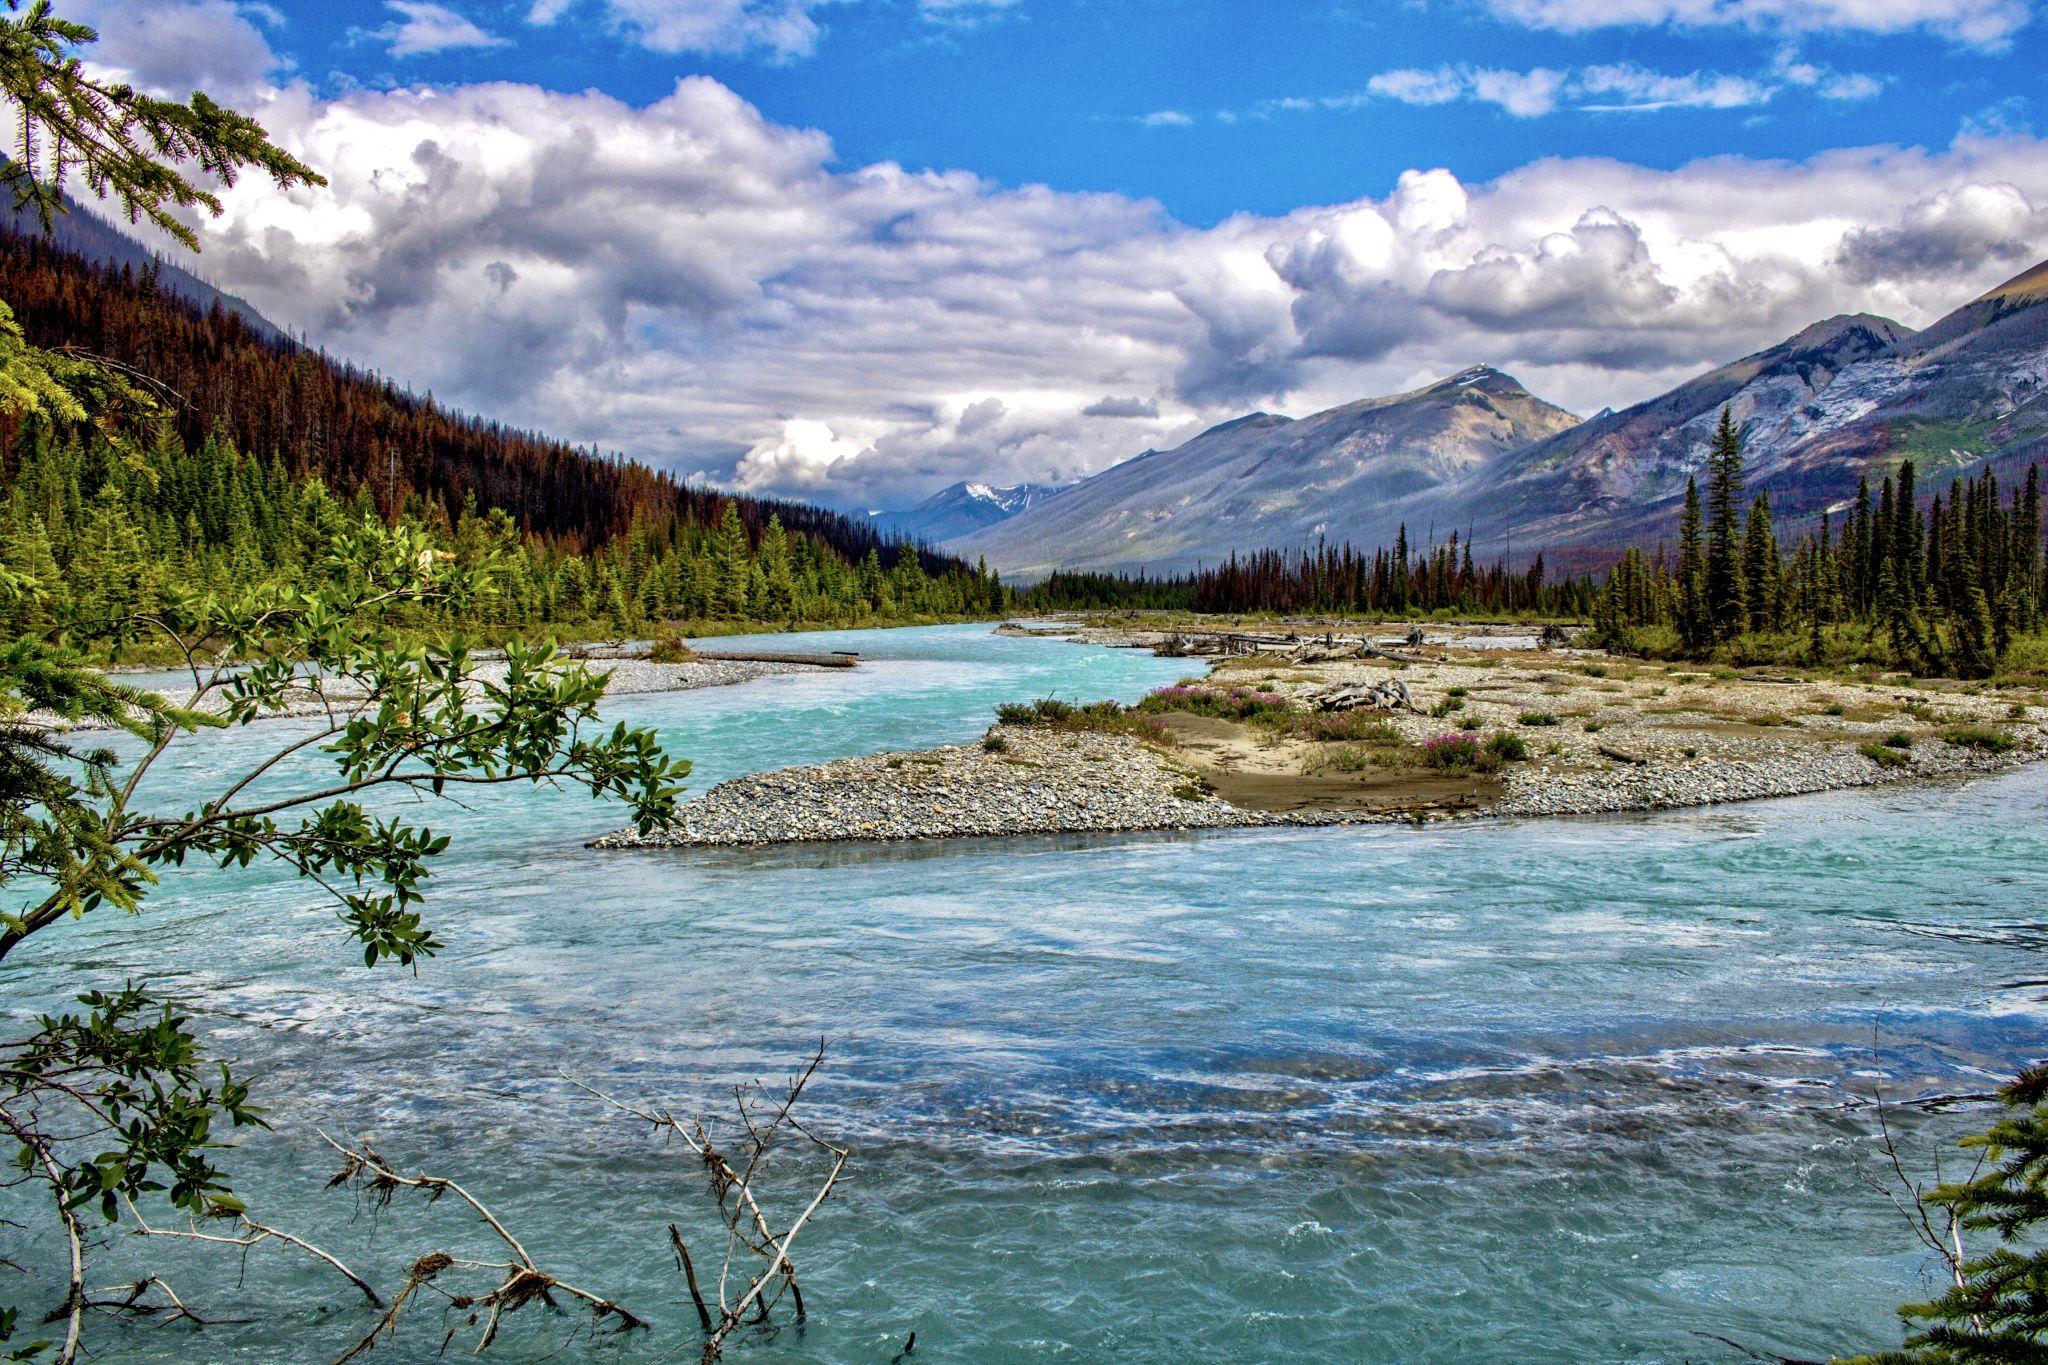 Simpson River Trailhead, Canada